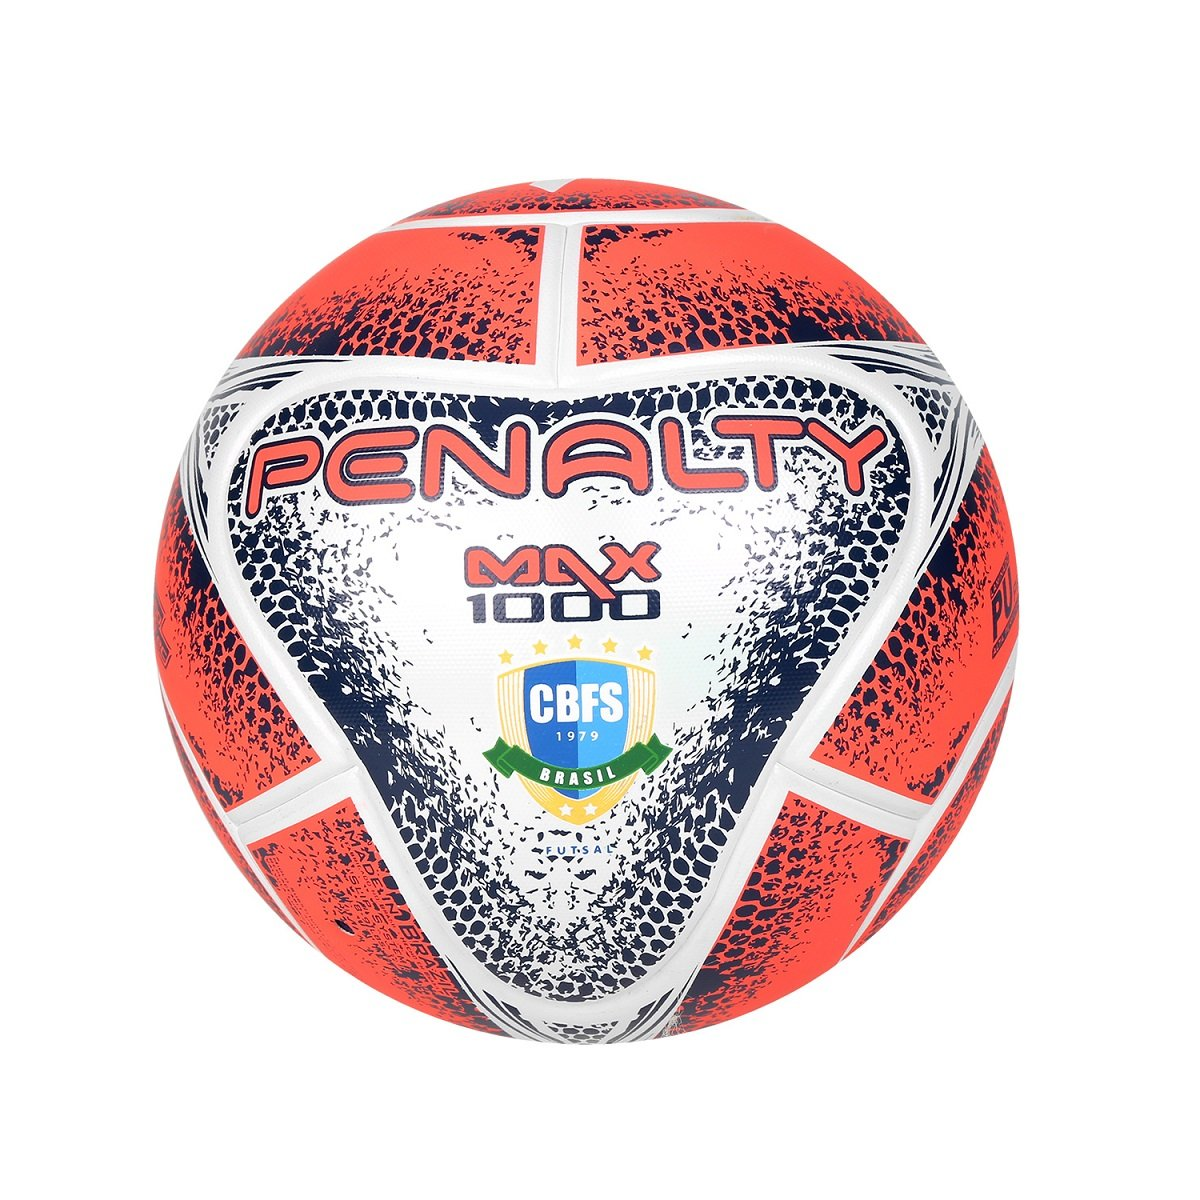 Bola Futsal Penalty Max 1000 VIII 541483-1461 - Branco Azul - Botas ... 4ef308f6034cc